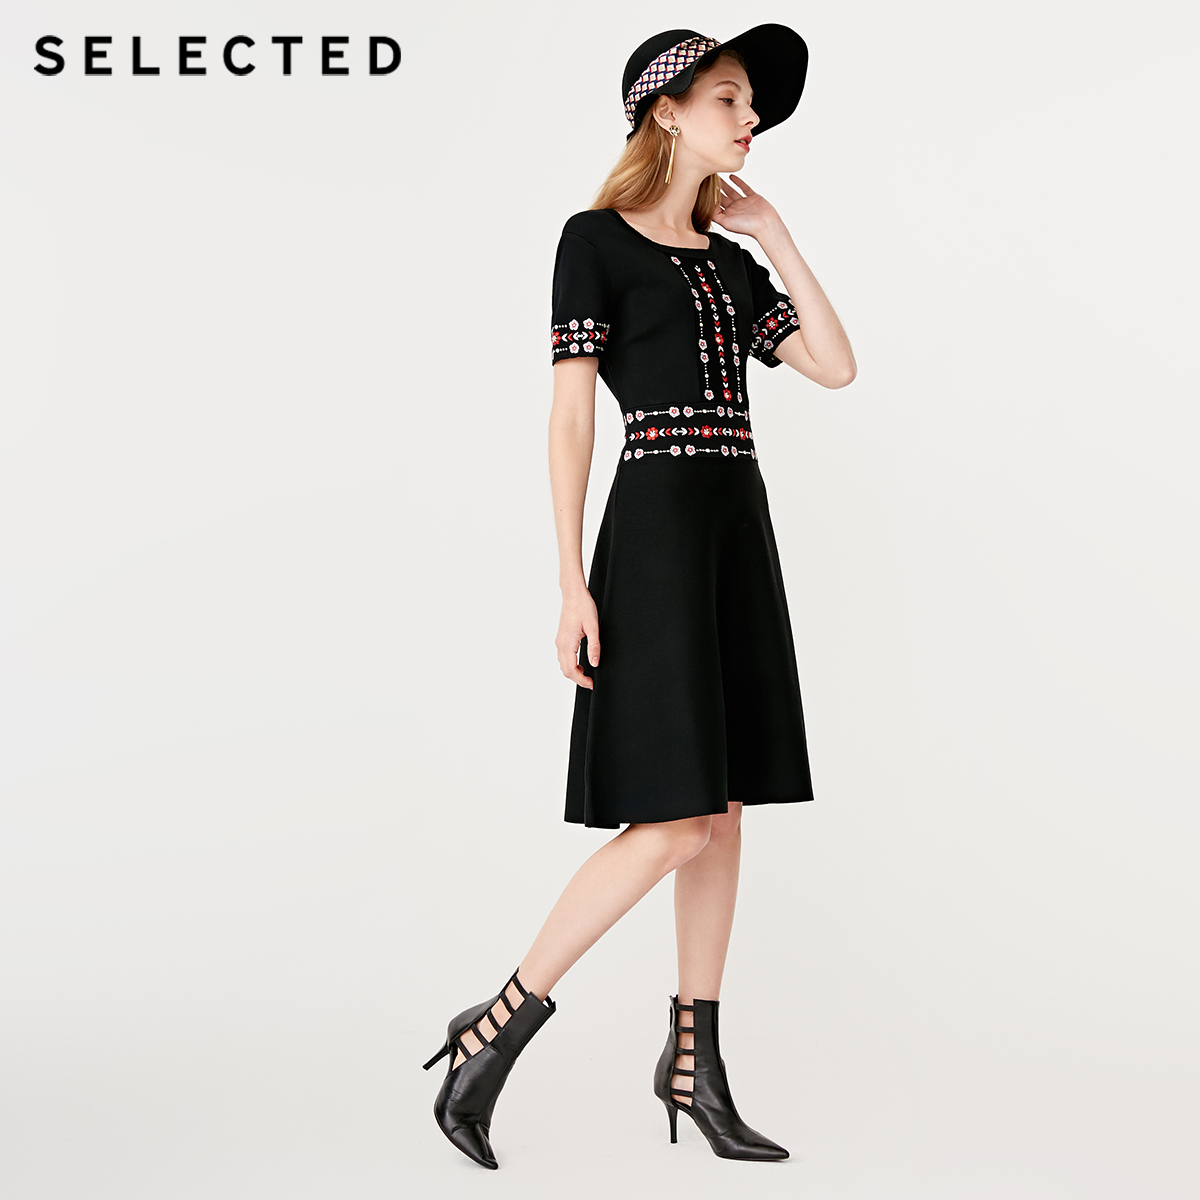 SELECTED Black Vintage Embroidery Slim Fit Midi Dress S 419146501